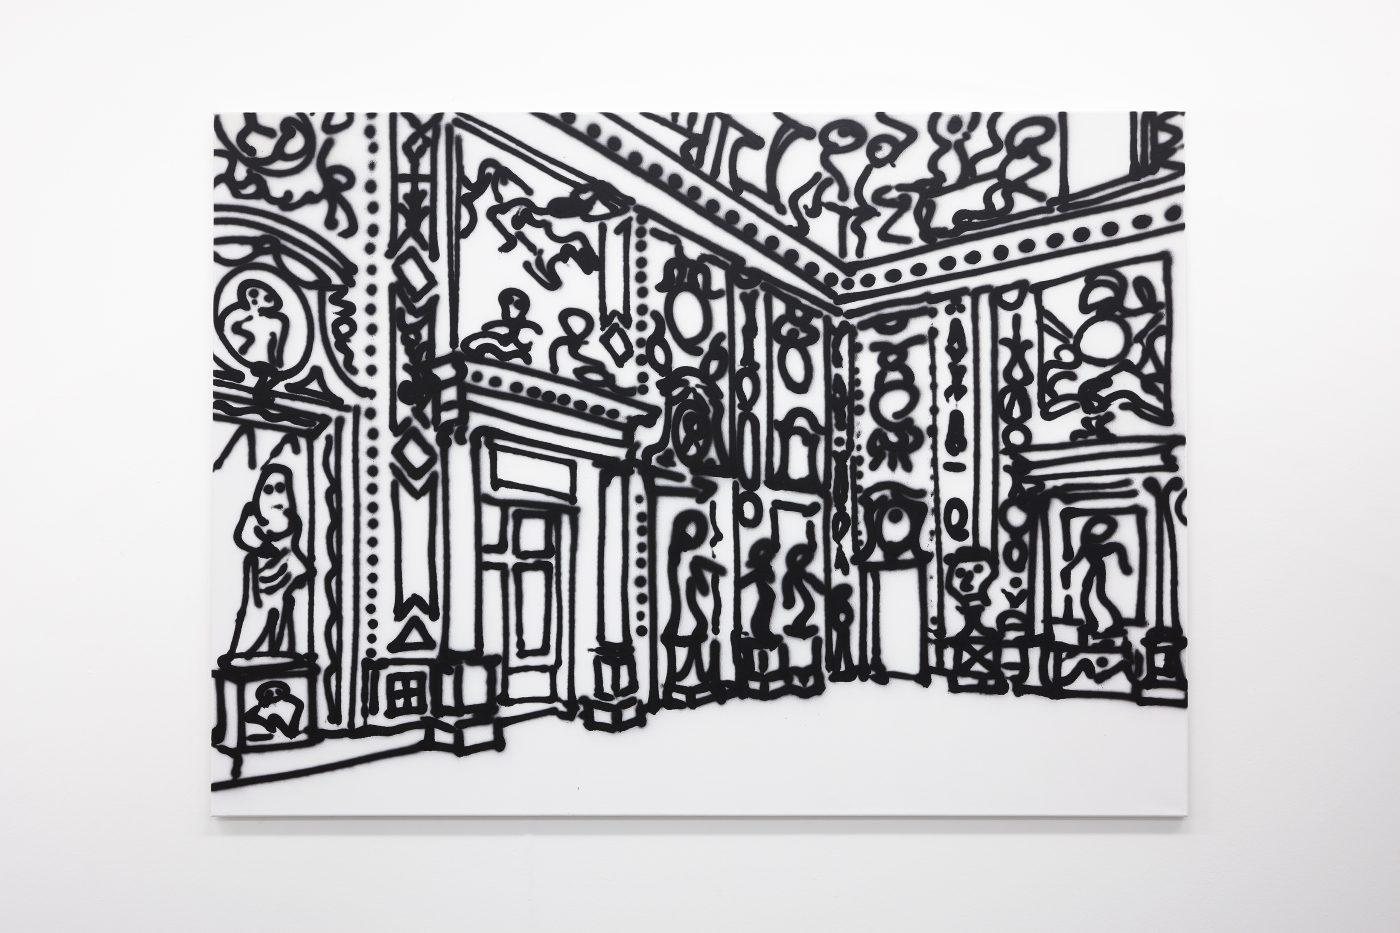 Galerie Lange + Pult – Artmonte-carlo 2016